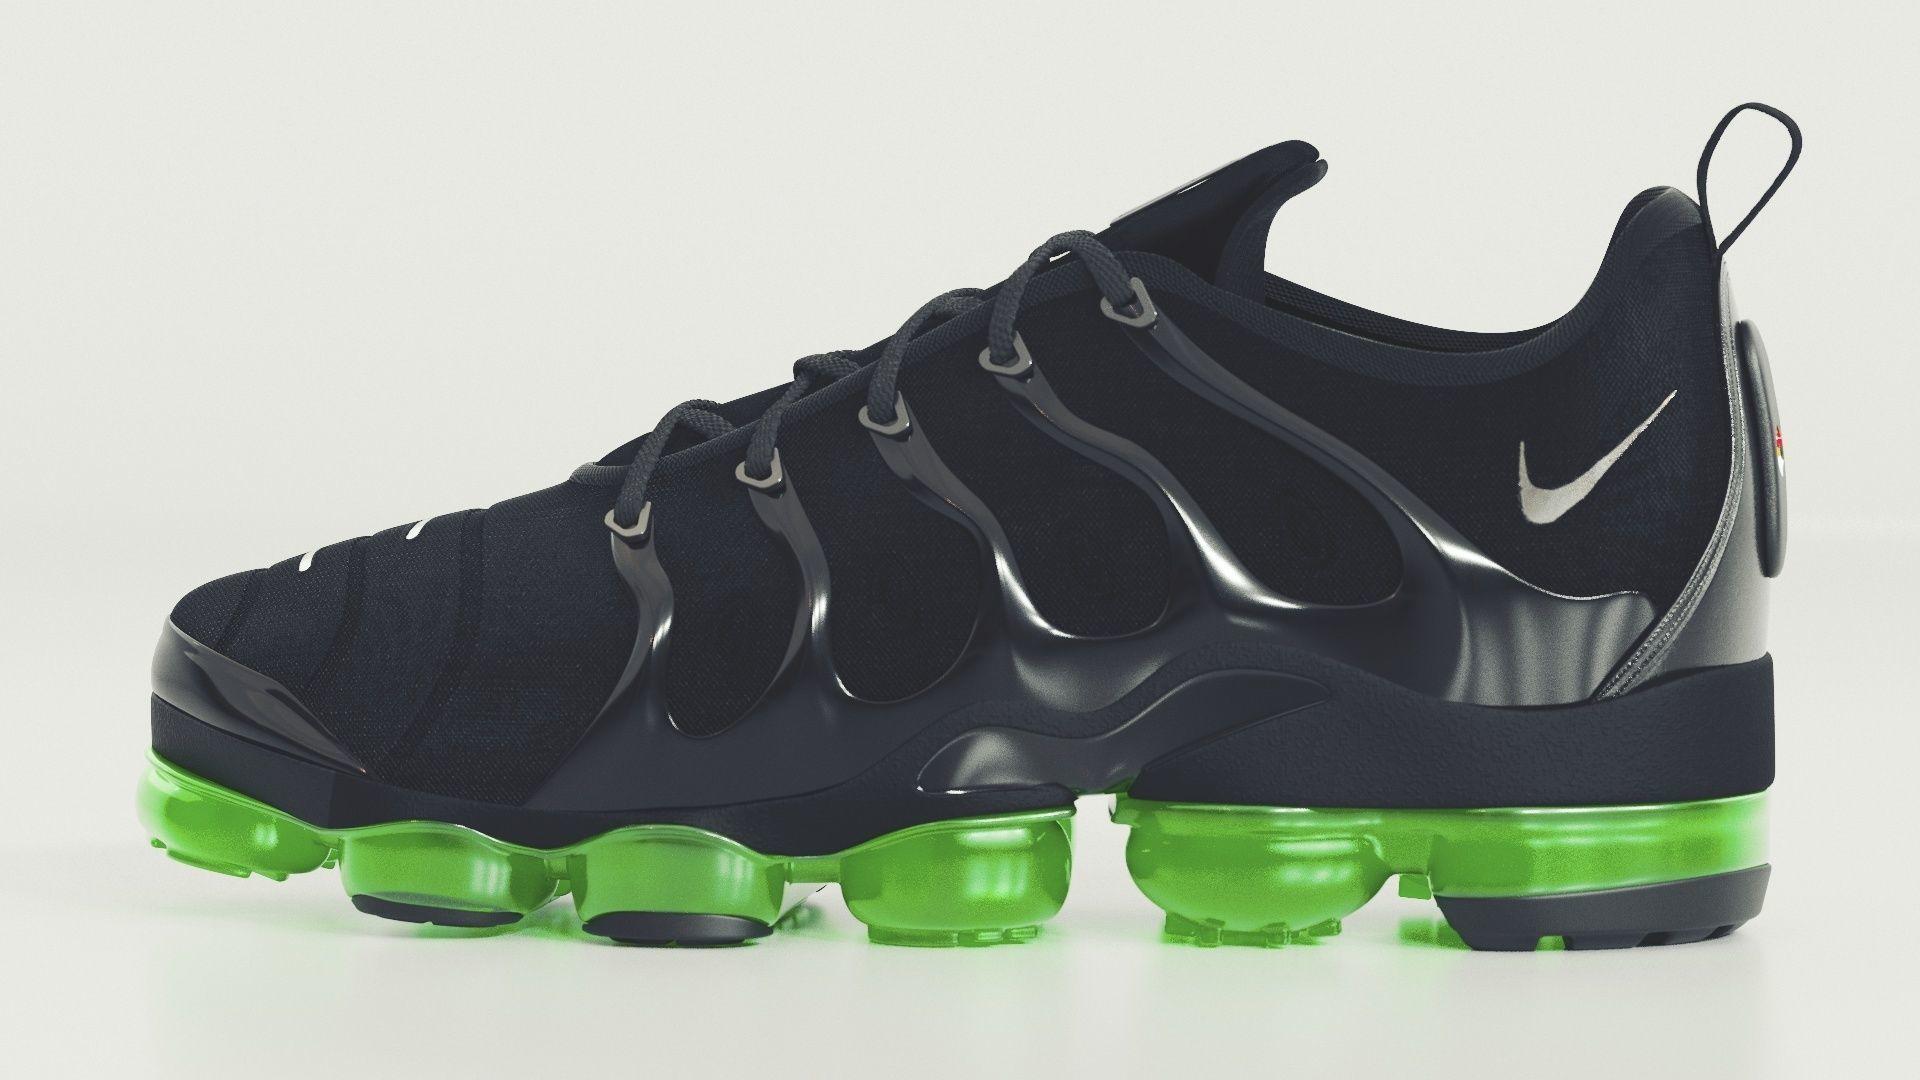 Nike Air Vapormax Plus Black Bolt